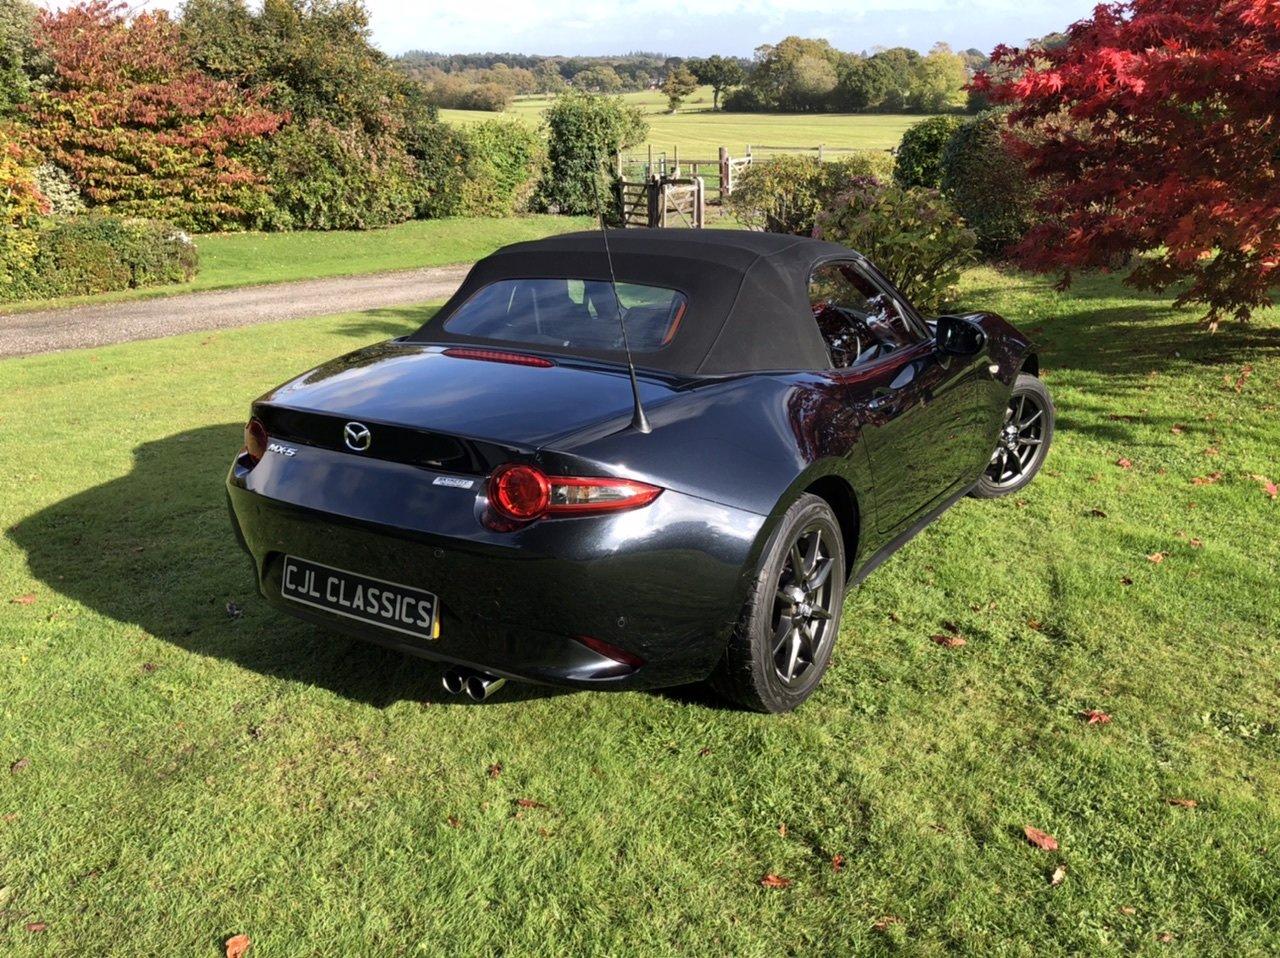 2018 Mazda MX-5 Sport Nav  For Sale (picture 2 of 6)